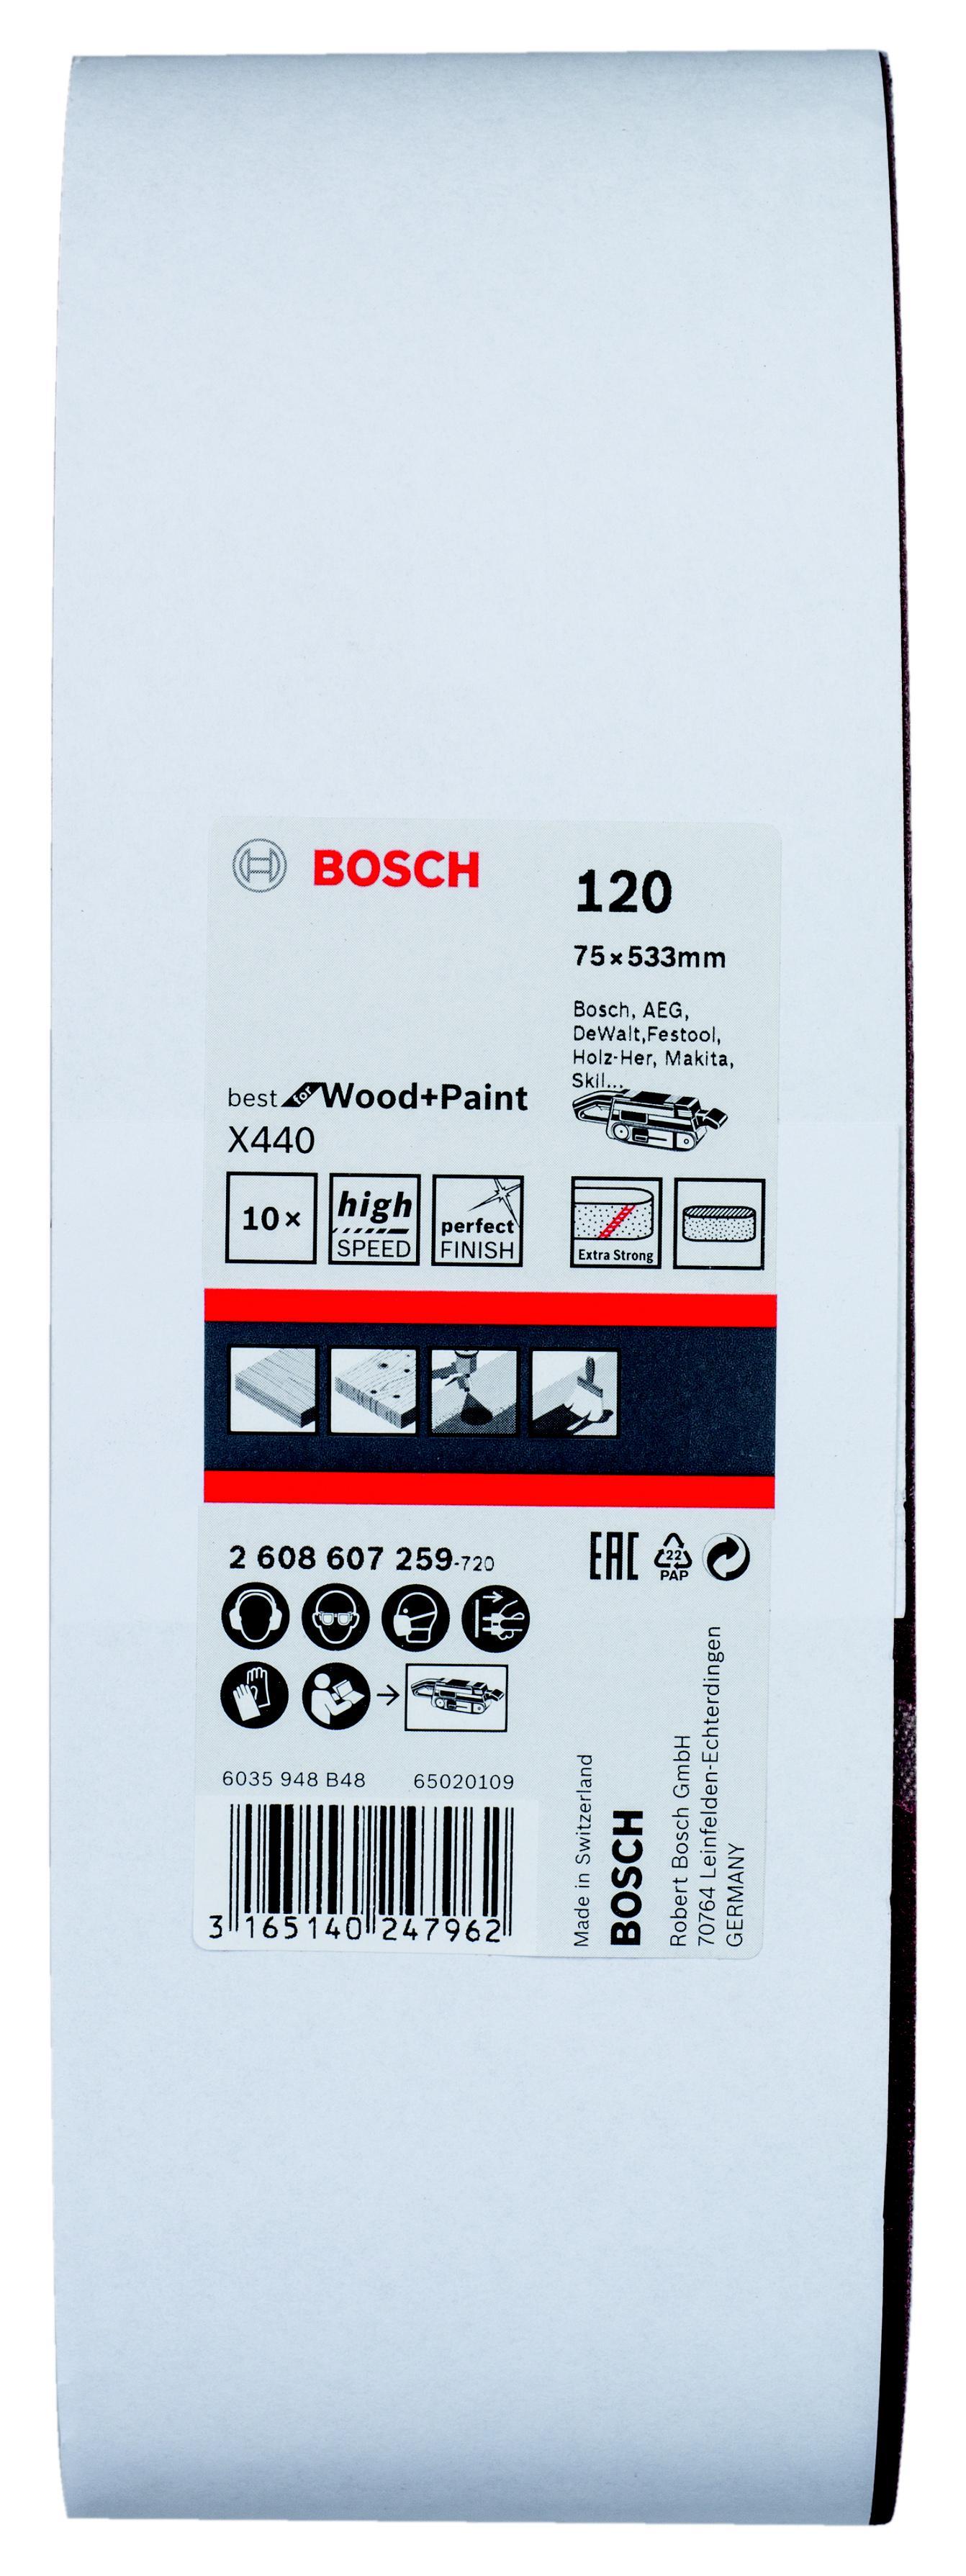 цена на Лента шлиф. бесконечная Bosch 75х533мм p120